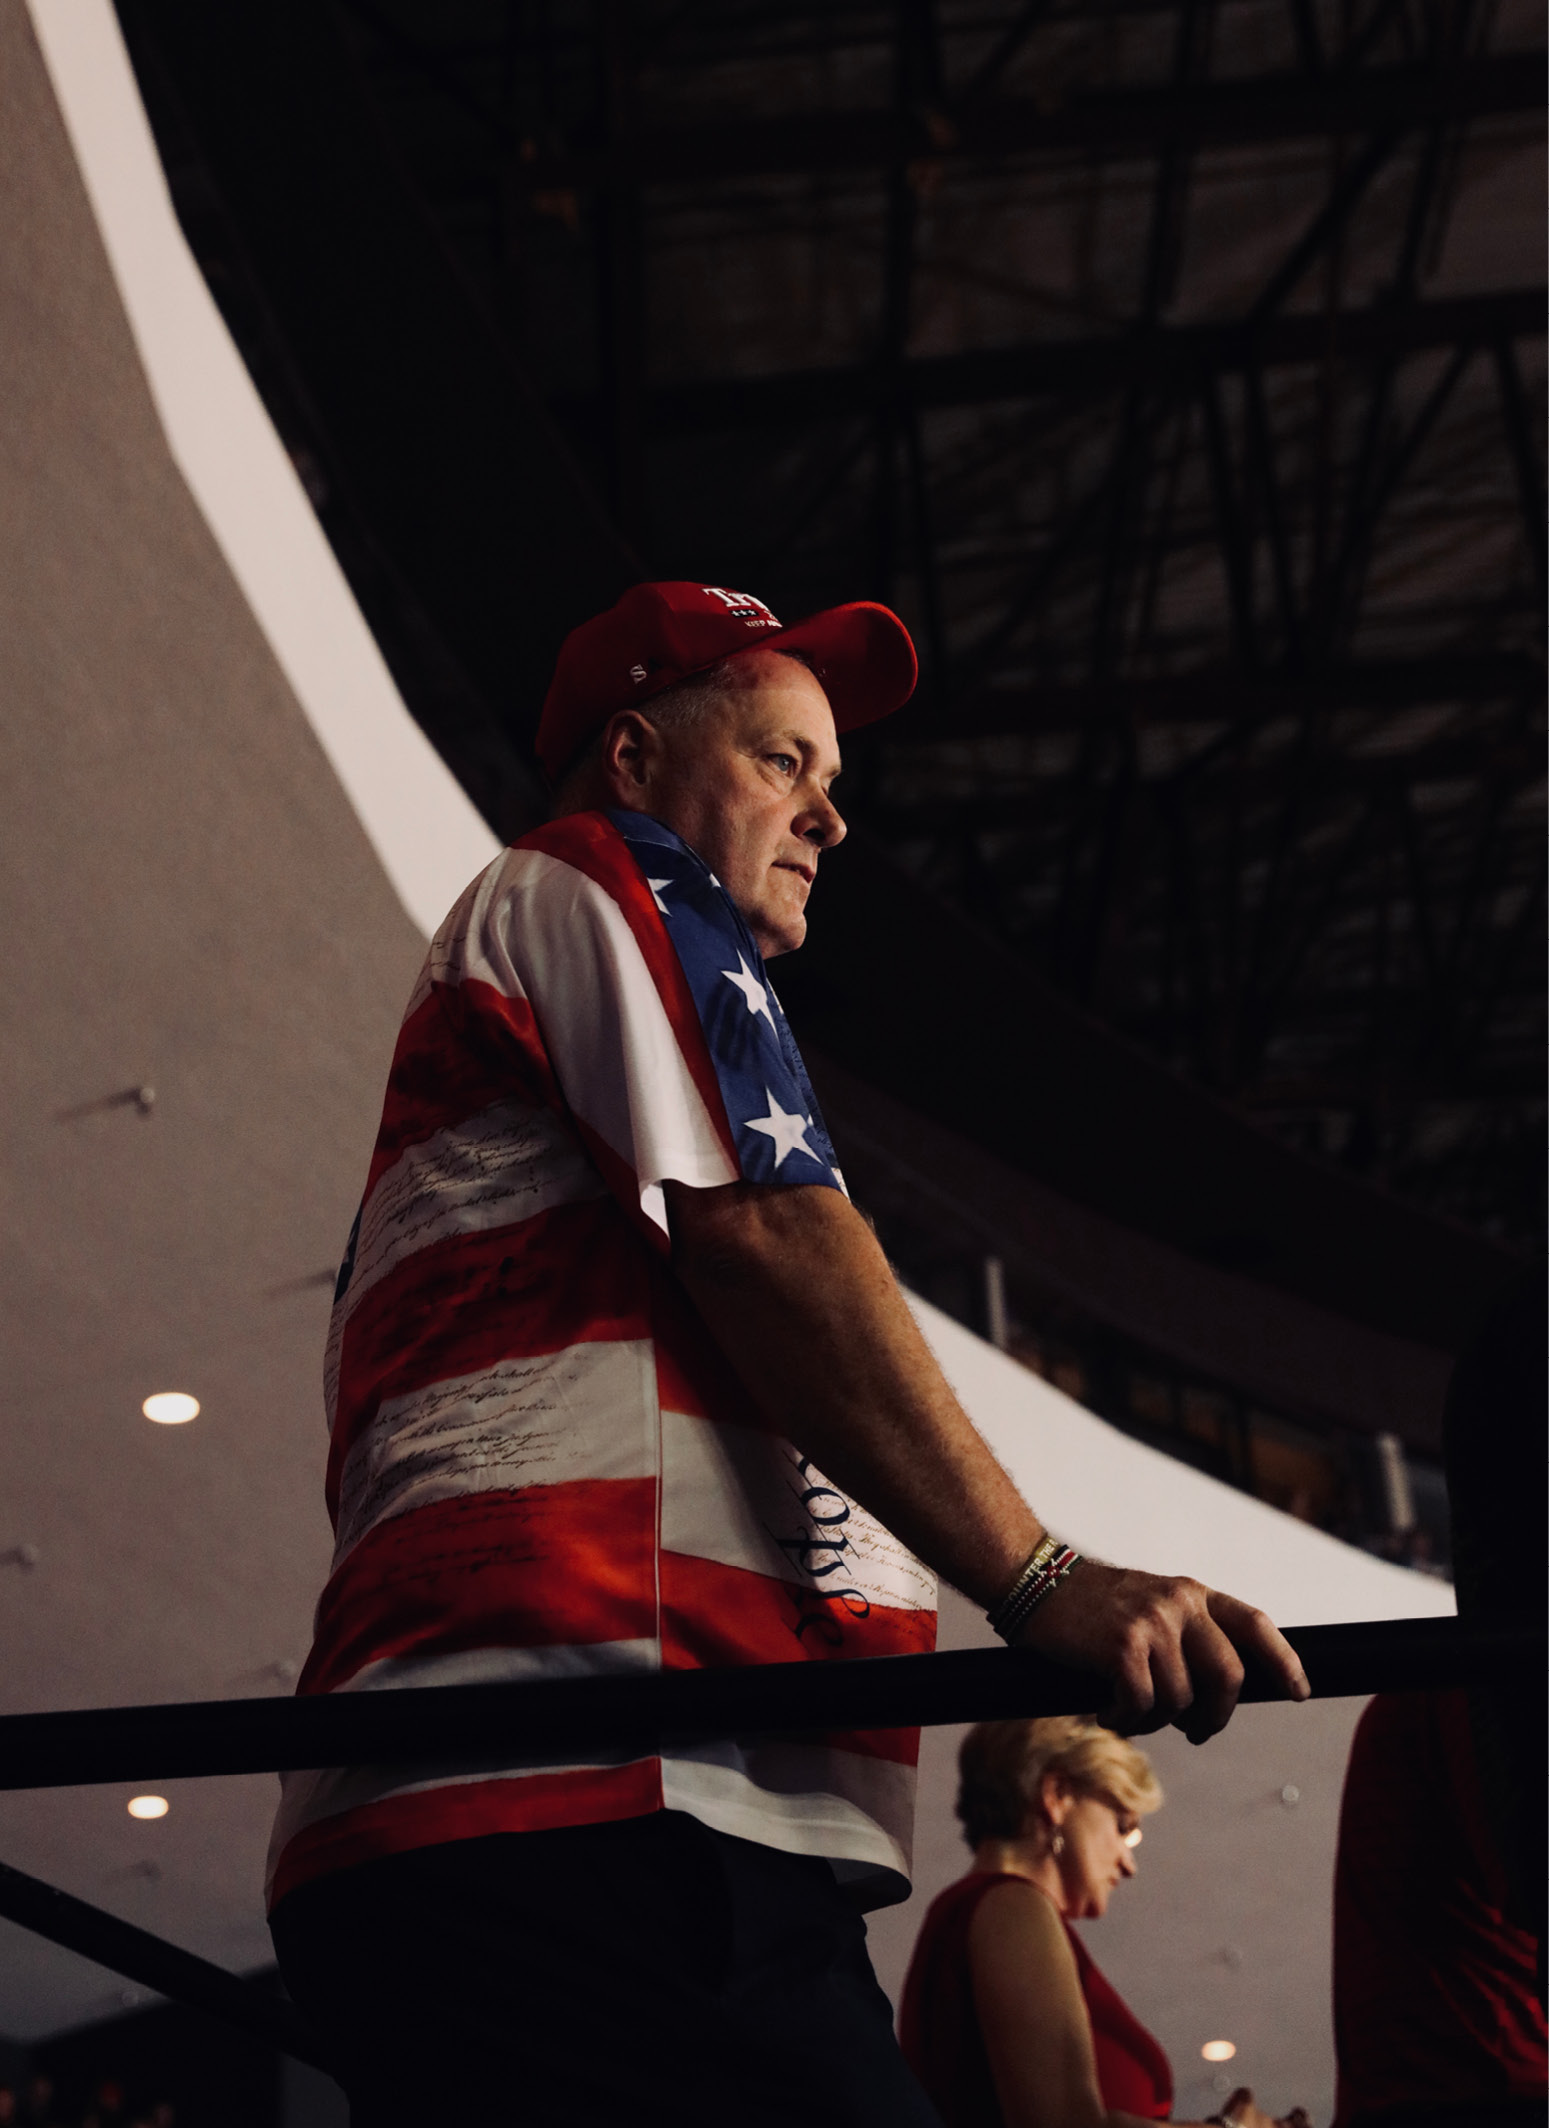 Andy Grant Trump Rally 8.1.19 - II14.jpg